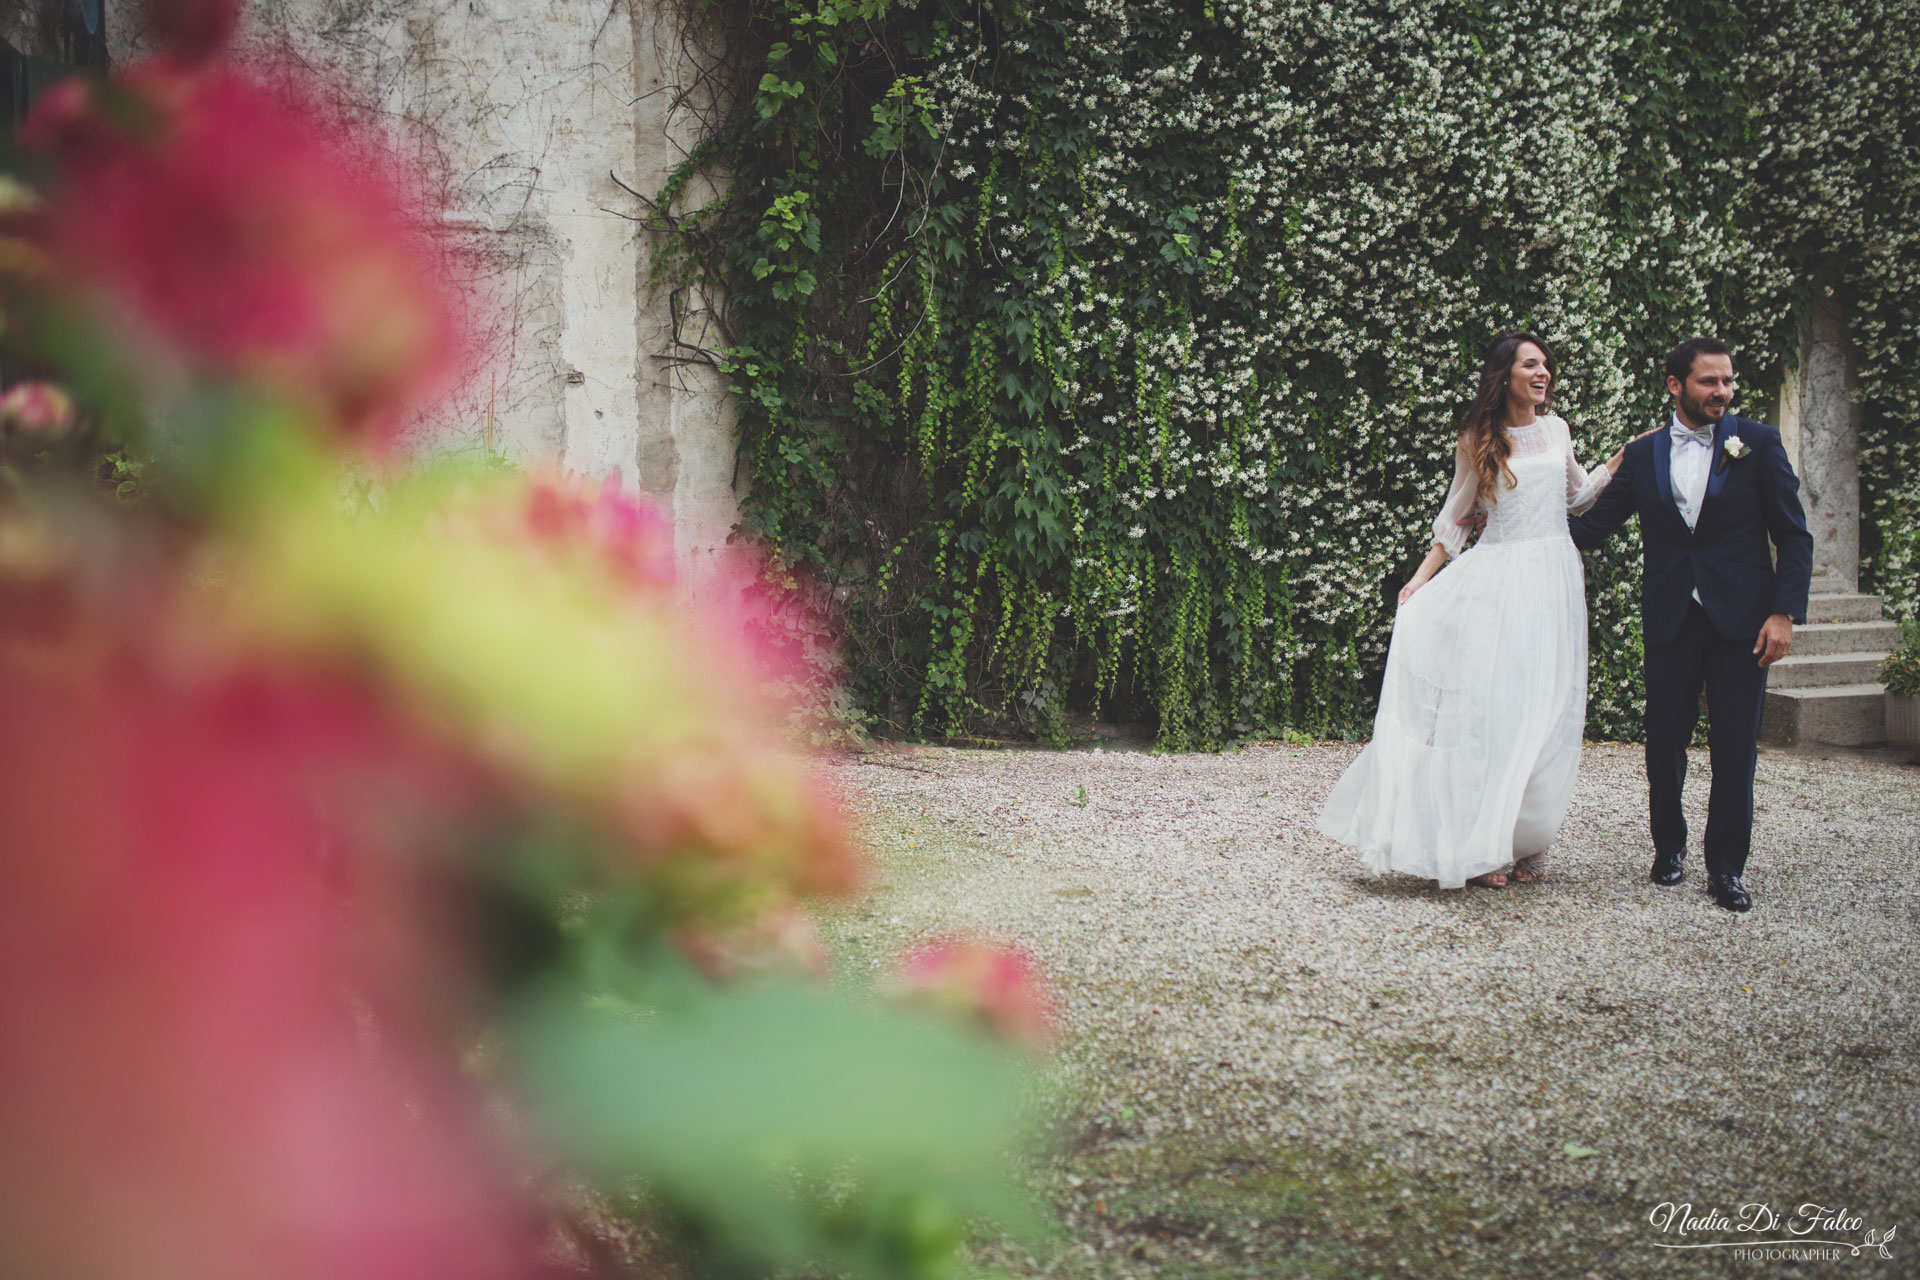 Idee Matrimonio Bohemien : Matrimonio boho chic grafica matrimoni